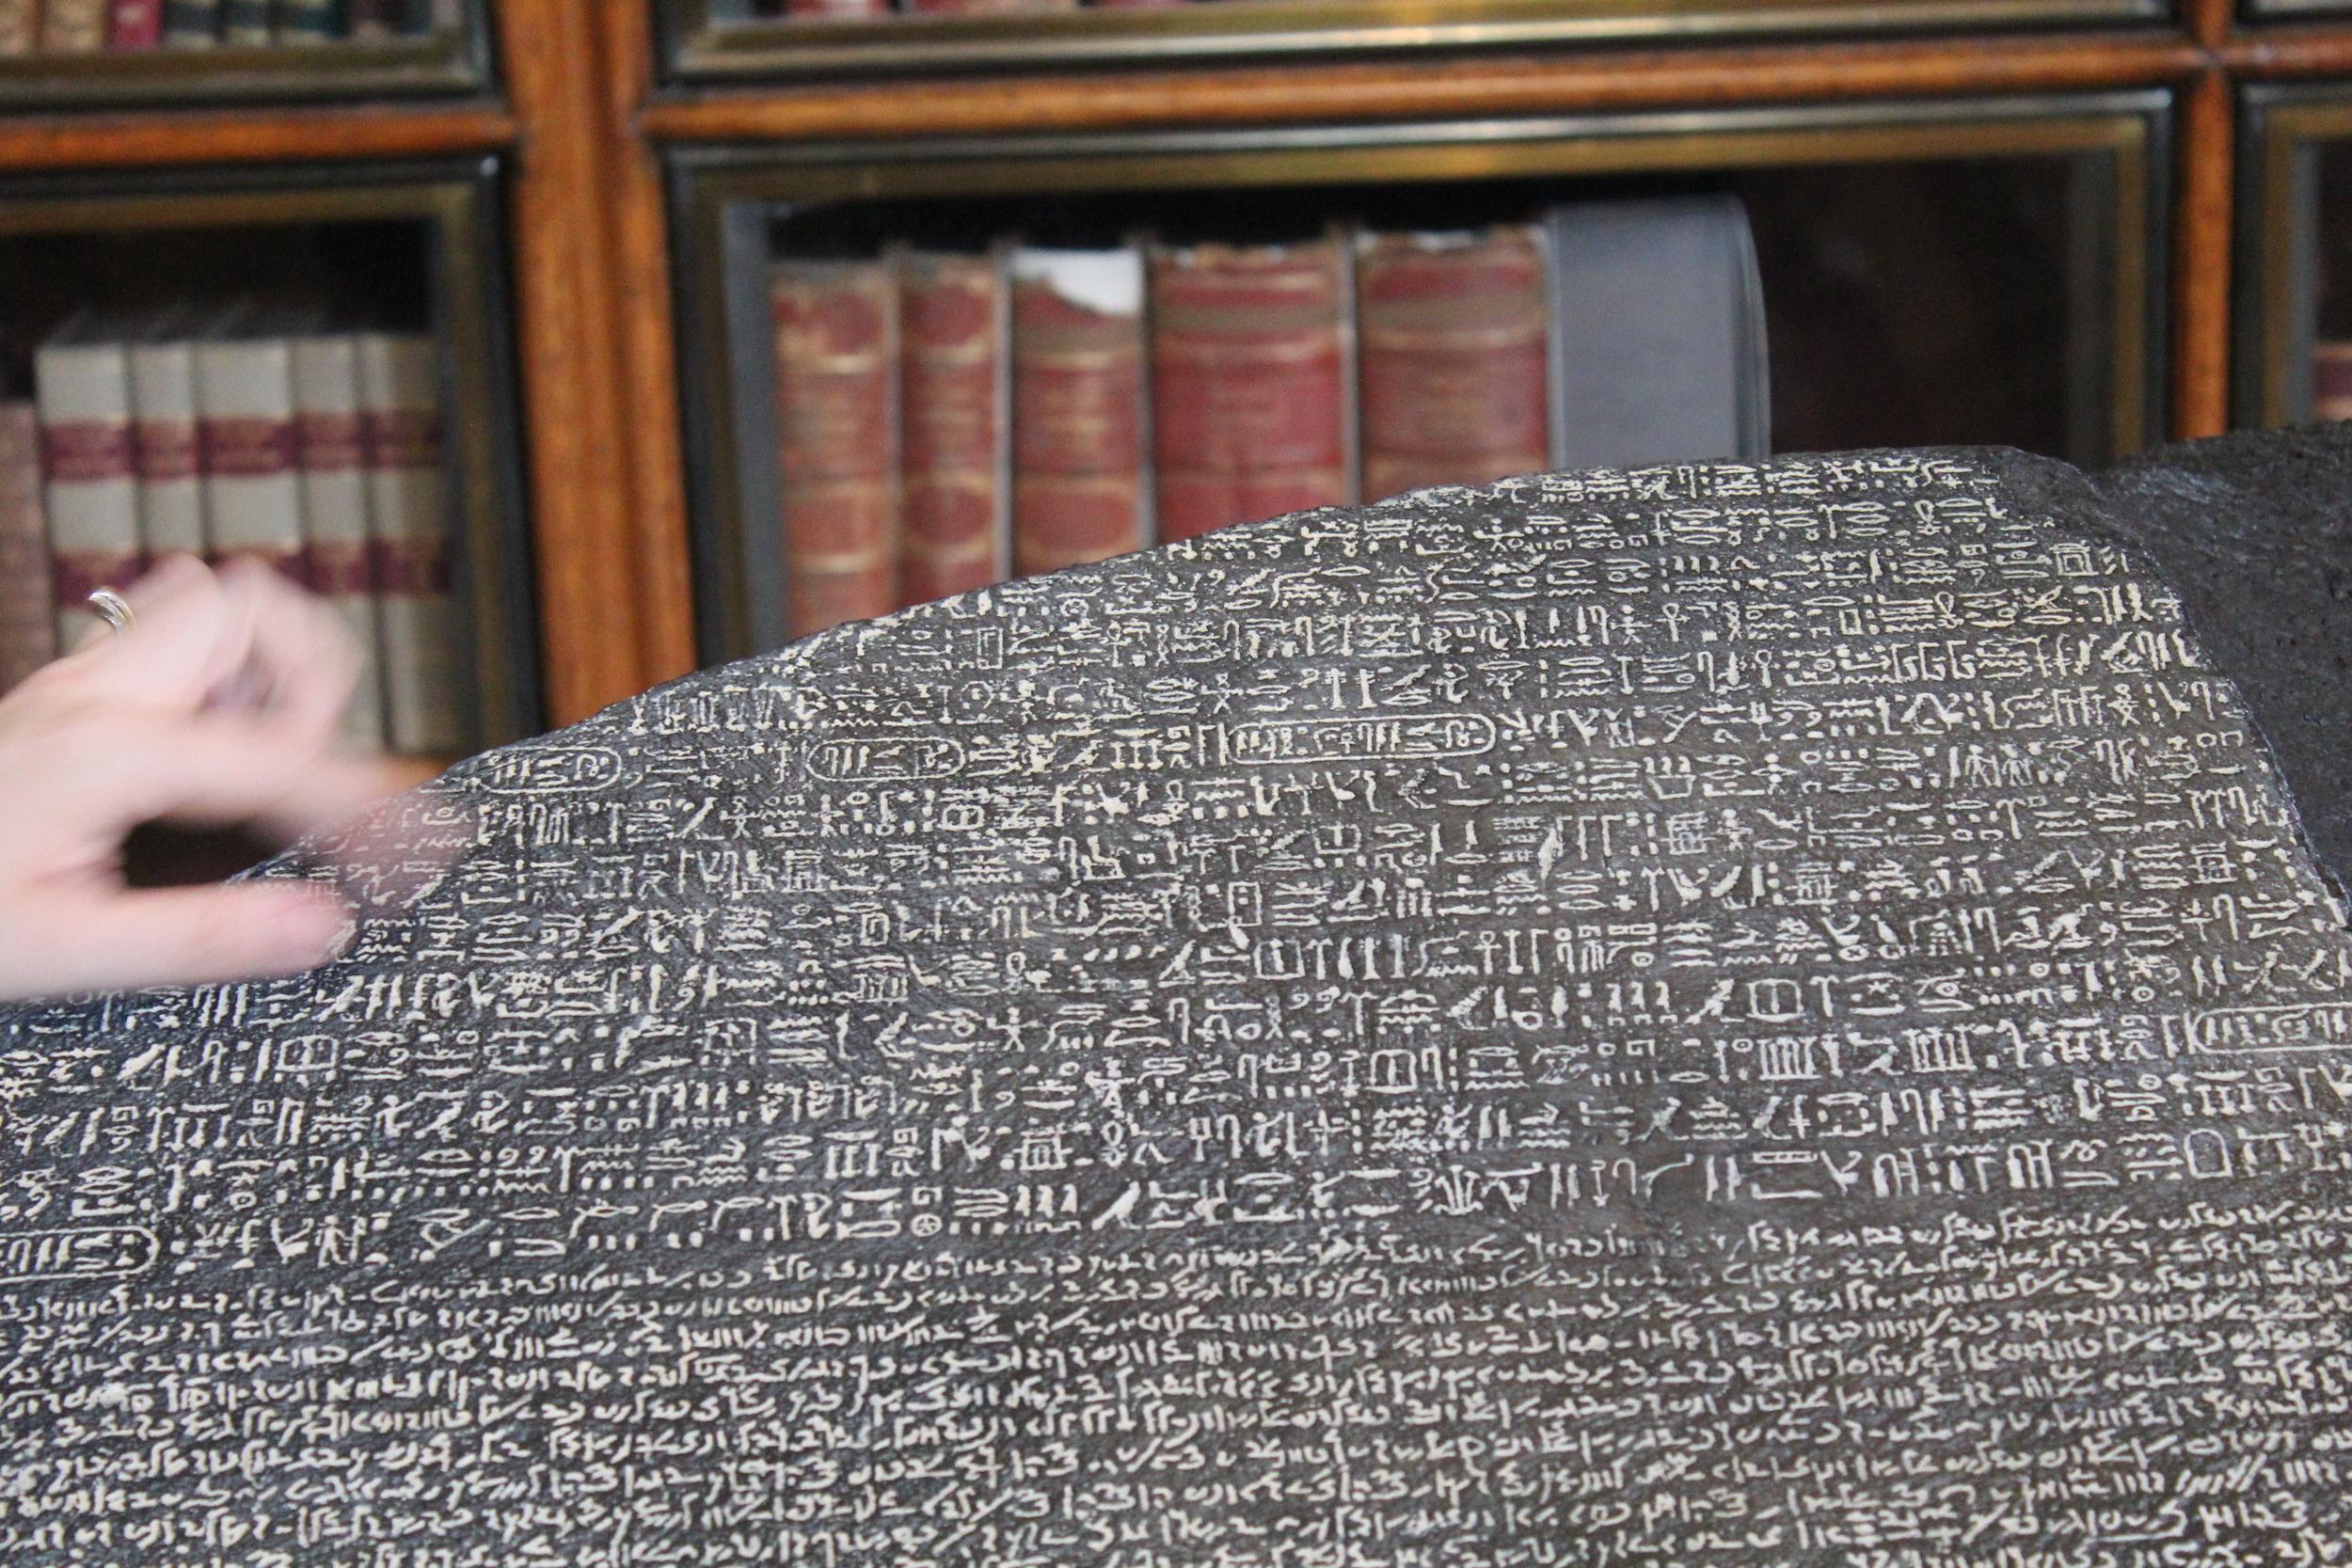 Fake Rosetta Stone